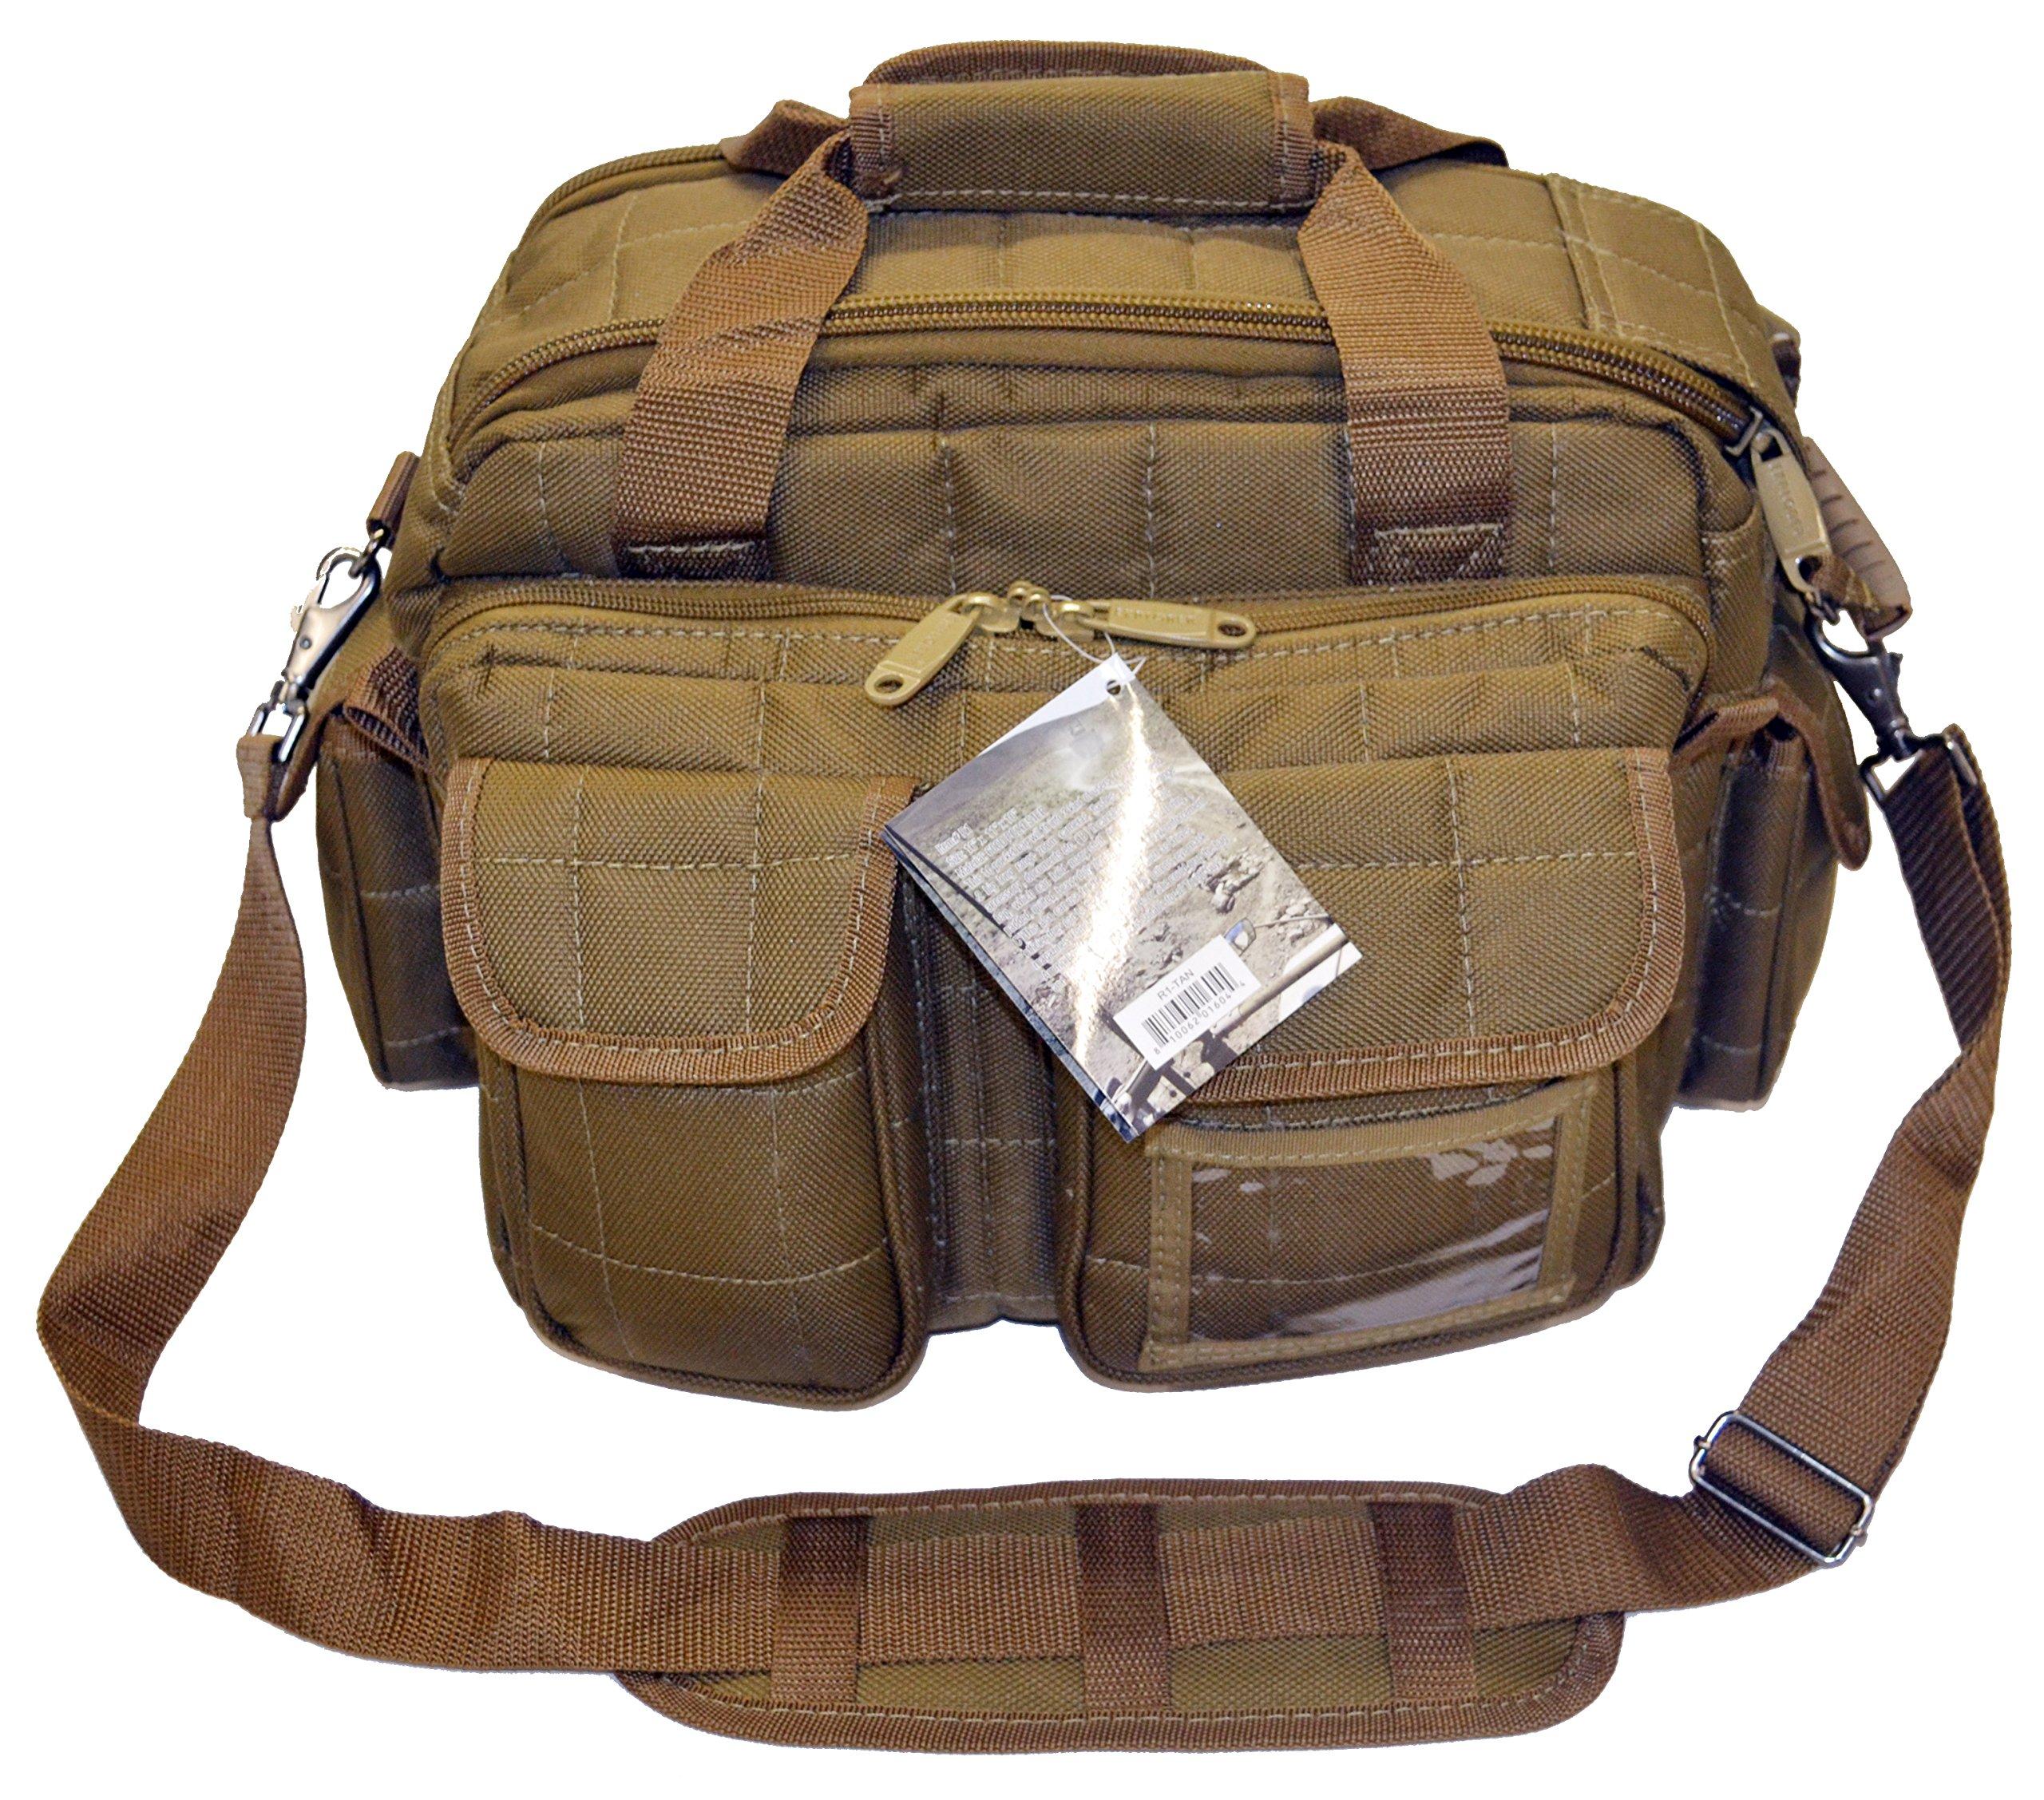 Explorer Tactical 12 Pistol Padded Gun and Gear Bag , Tan by Explorer